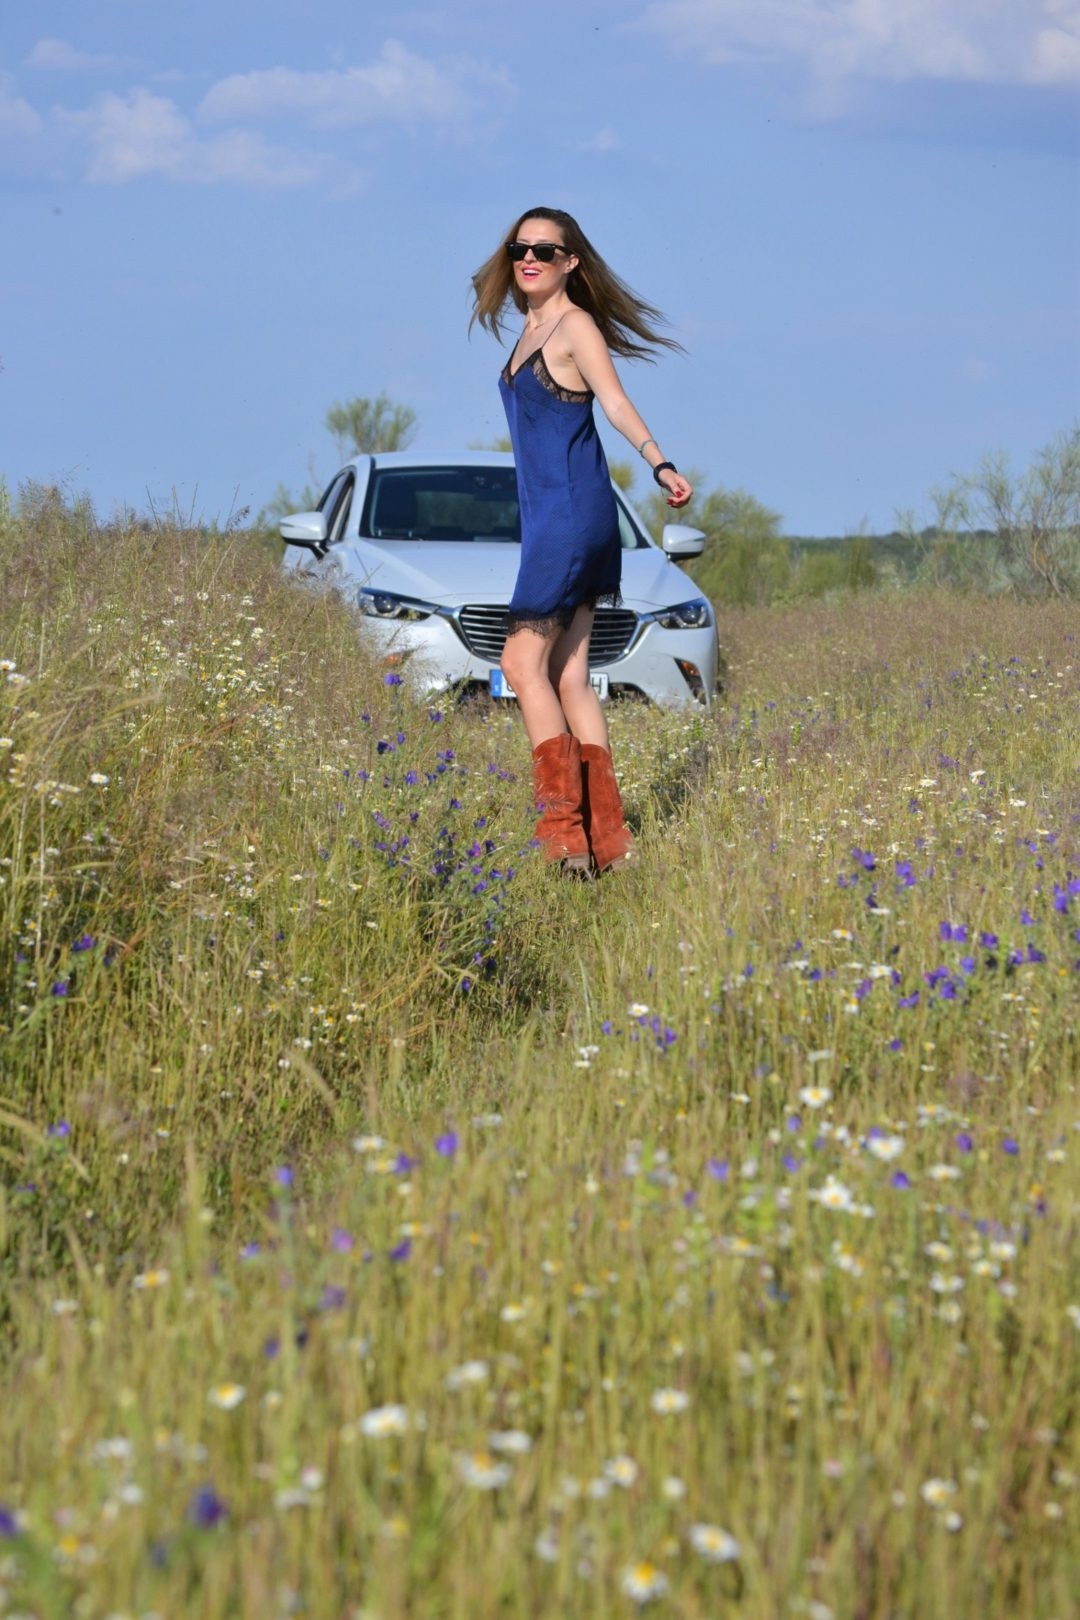 Mazda_CX3_Countryside_Lara_Martin_Gilarranz_Bymyheels (13)